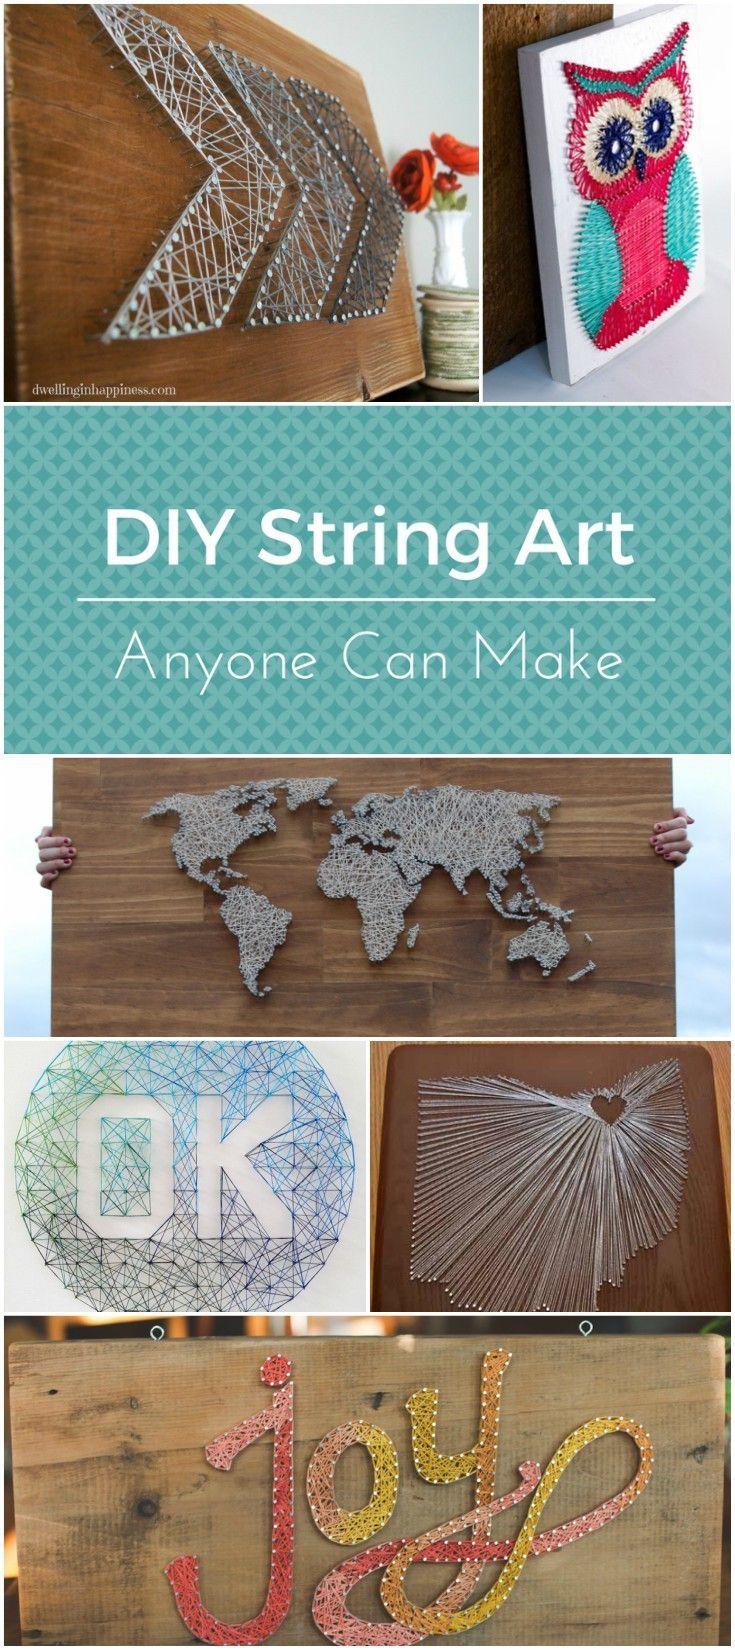 DIY string art designs anyone can make